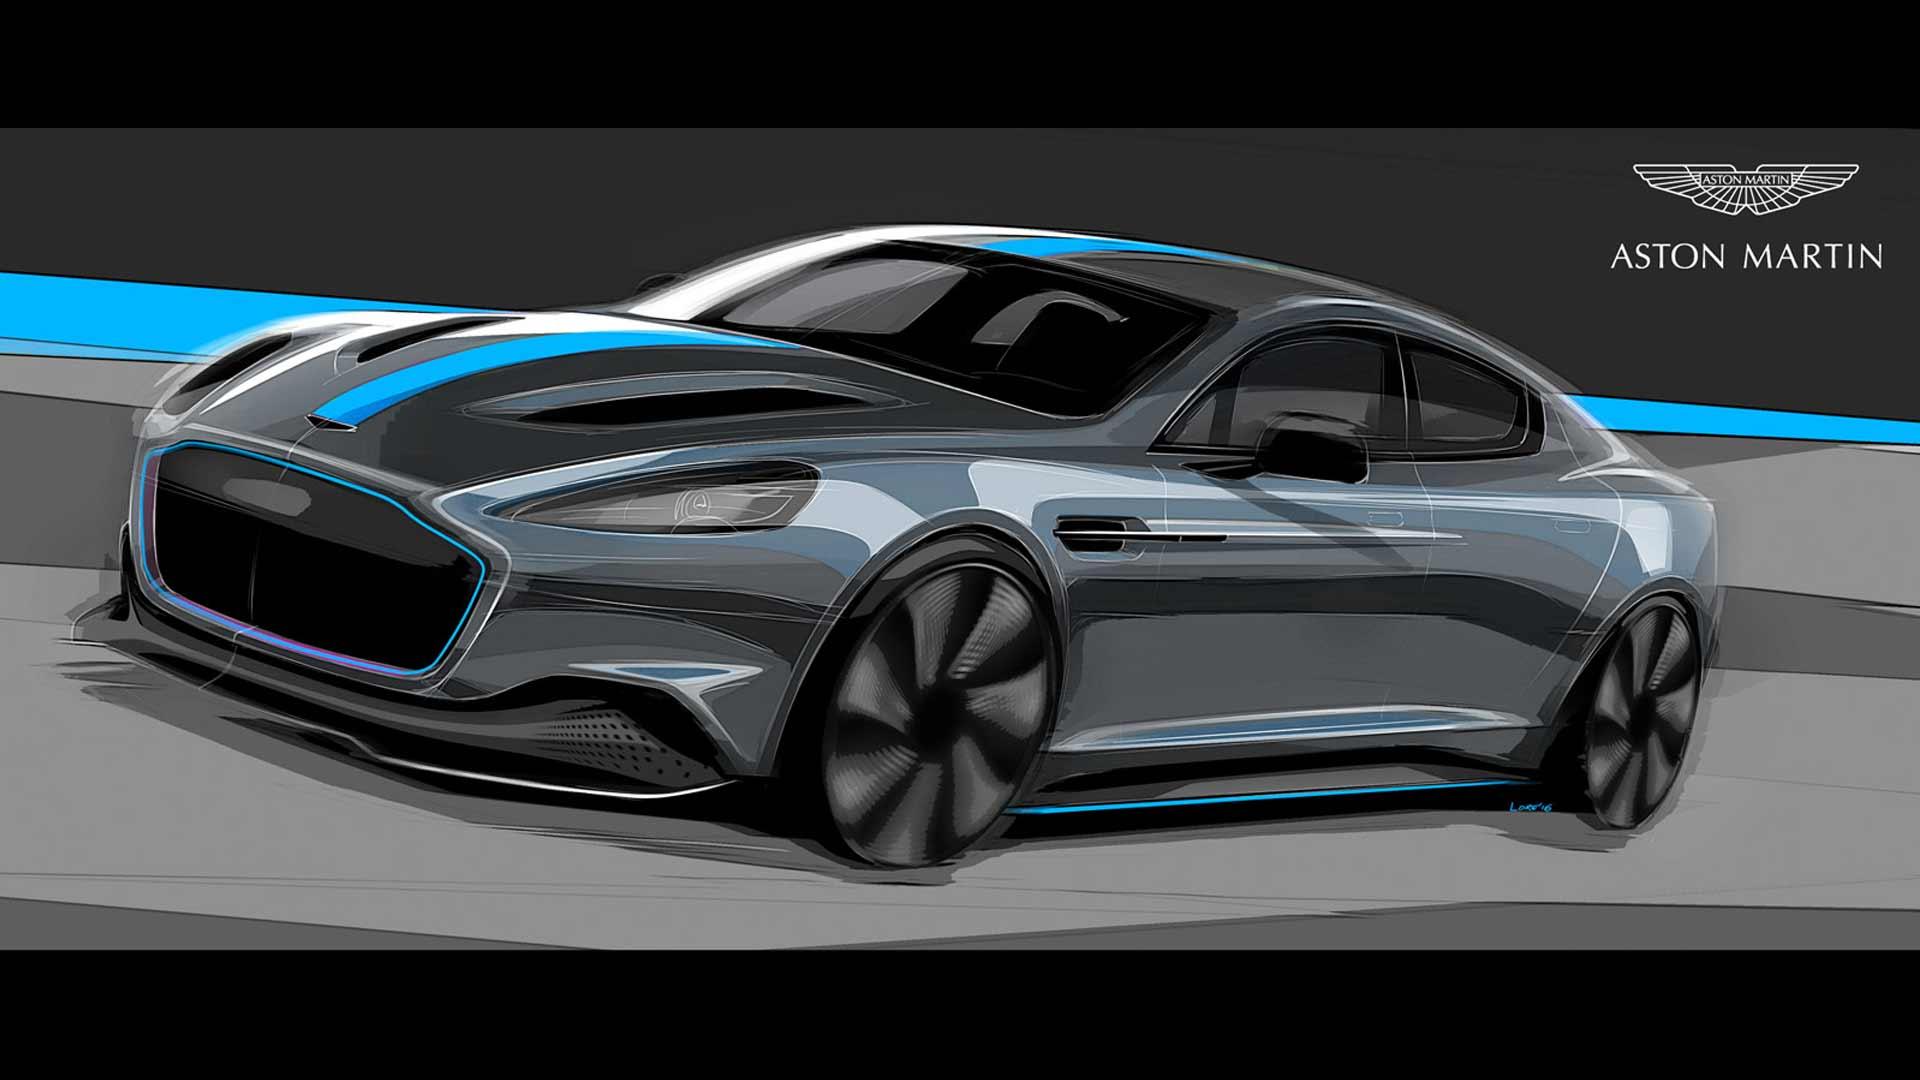 Aston-Martin-RapidE-electric